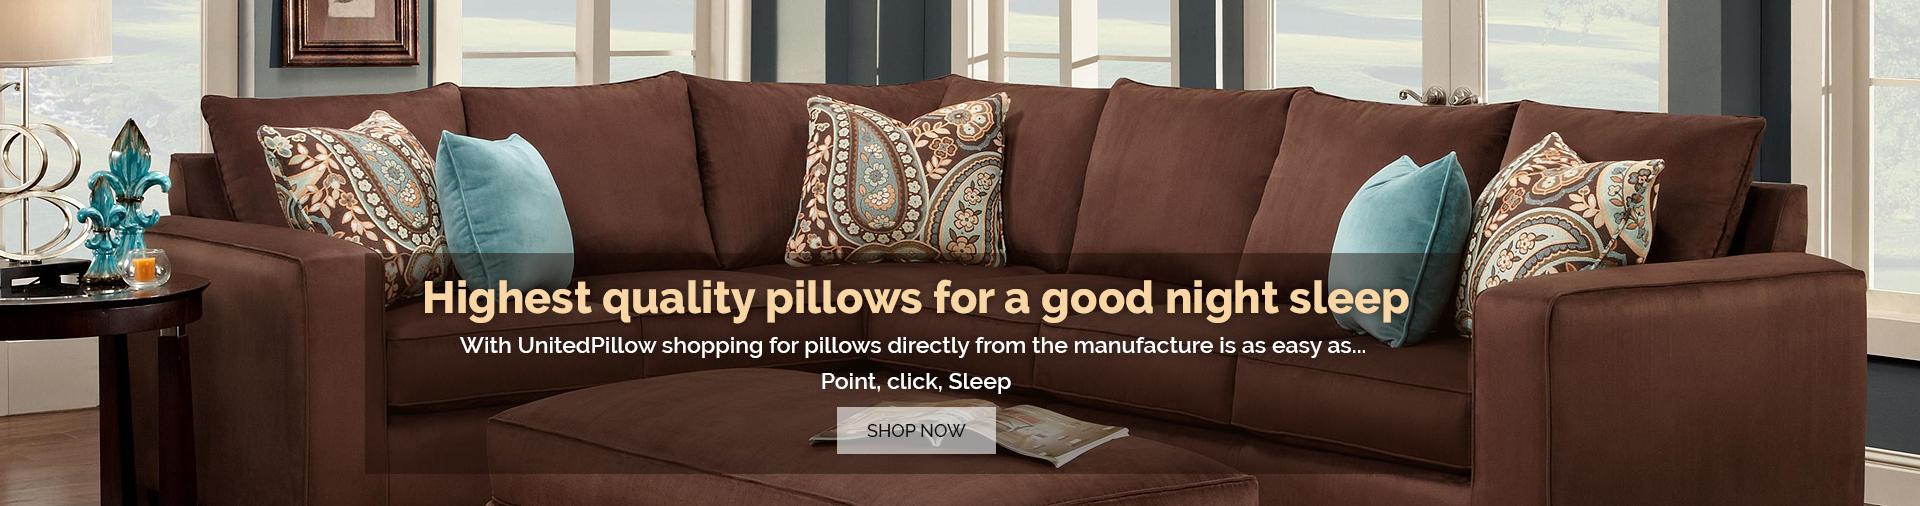 unitedpillows usa made pillows